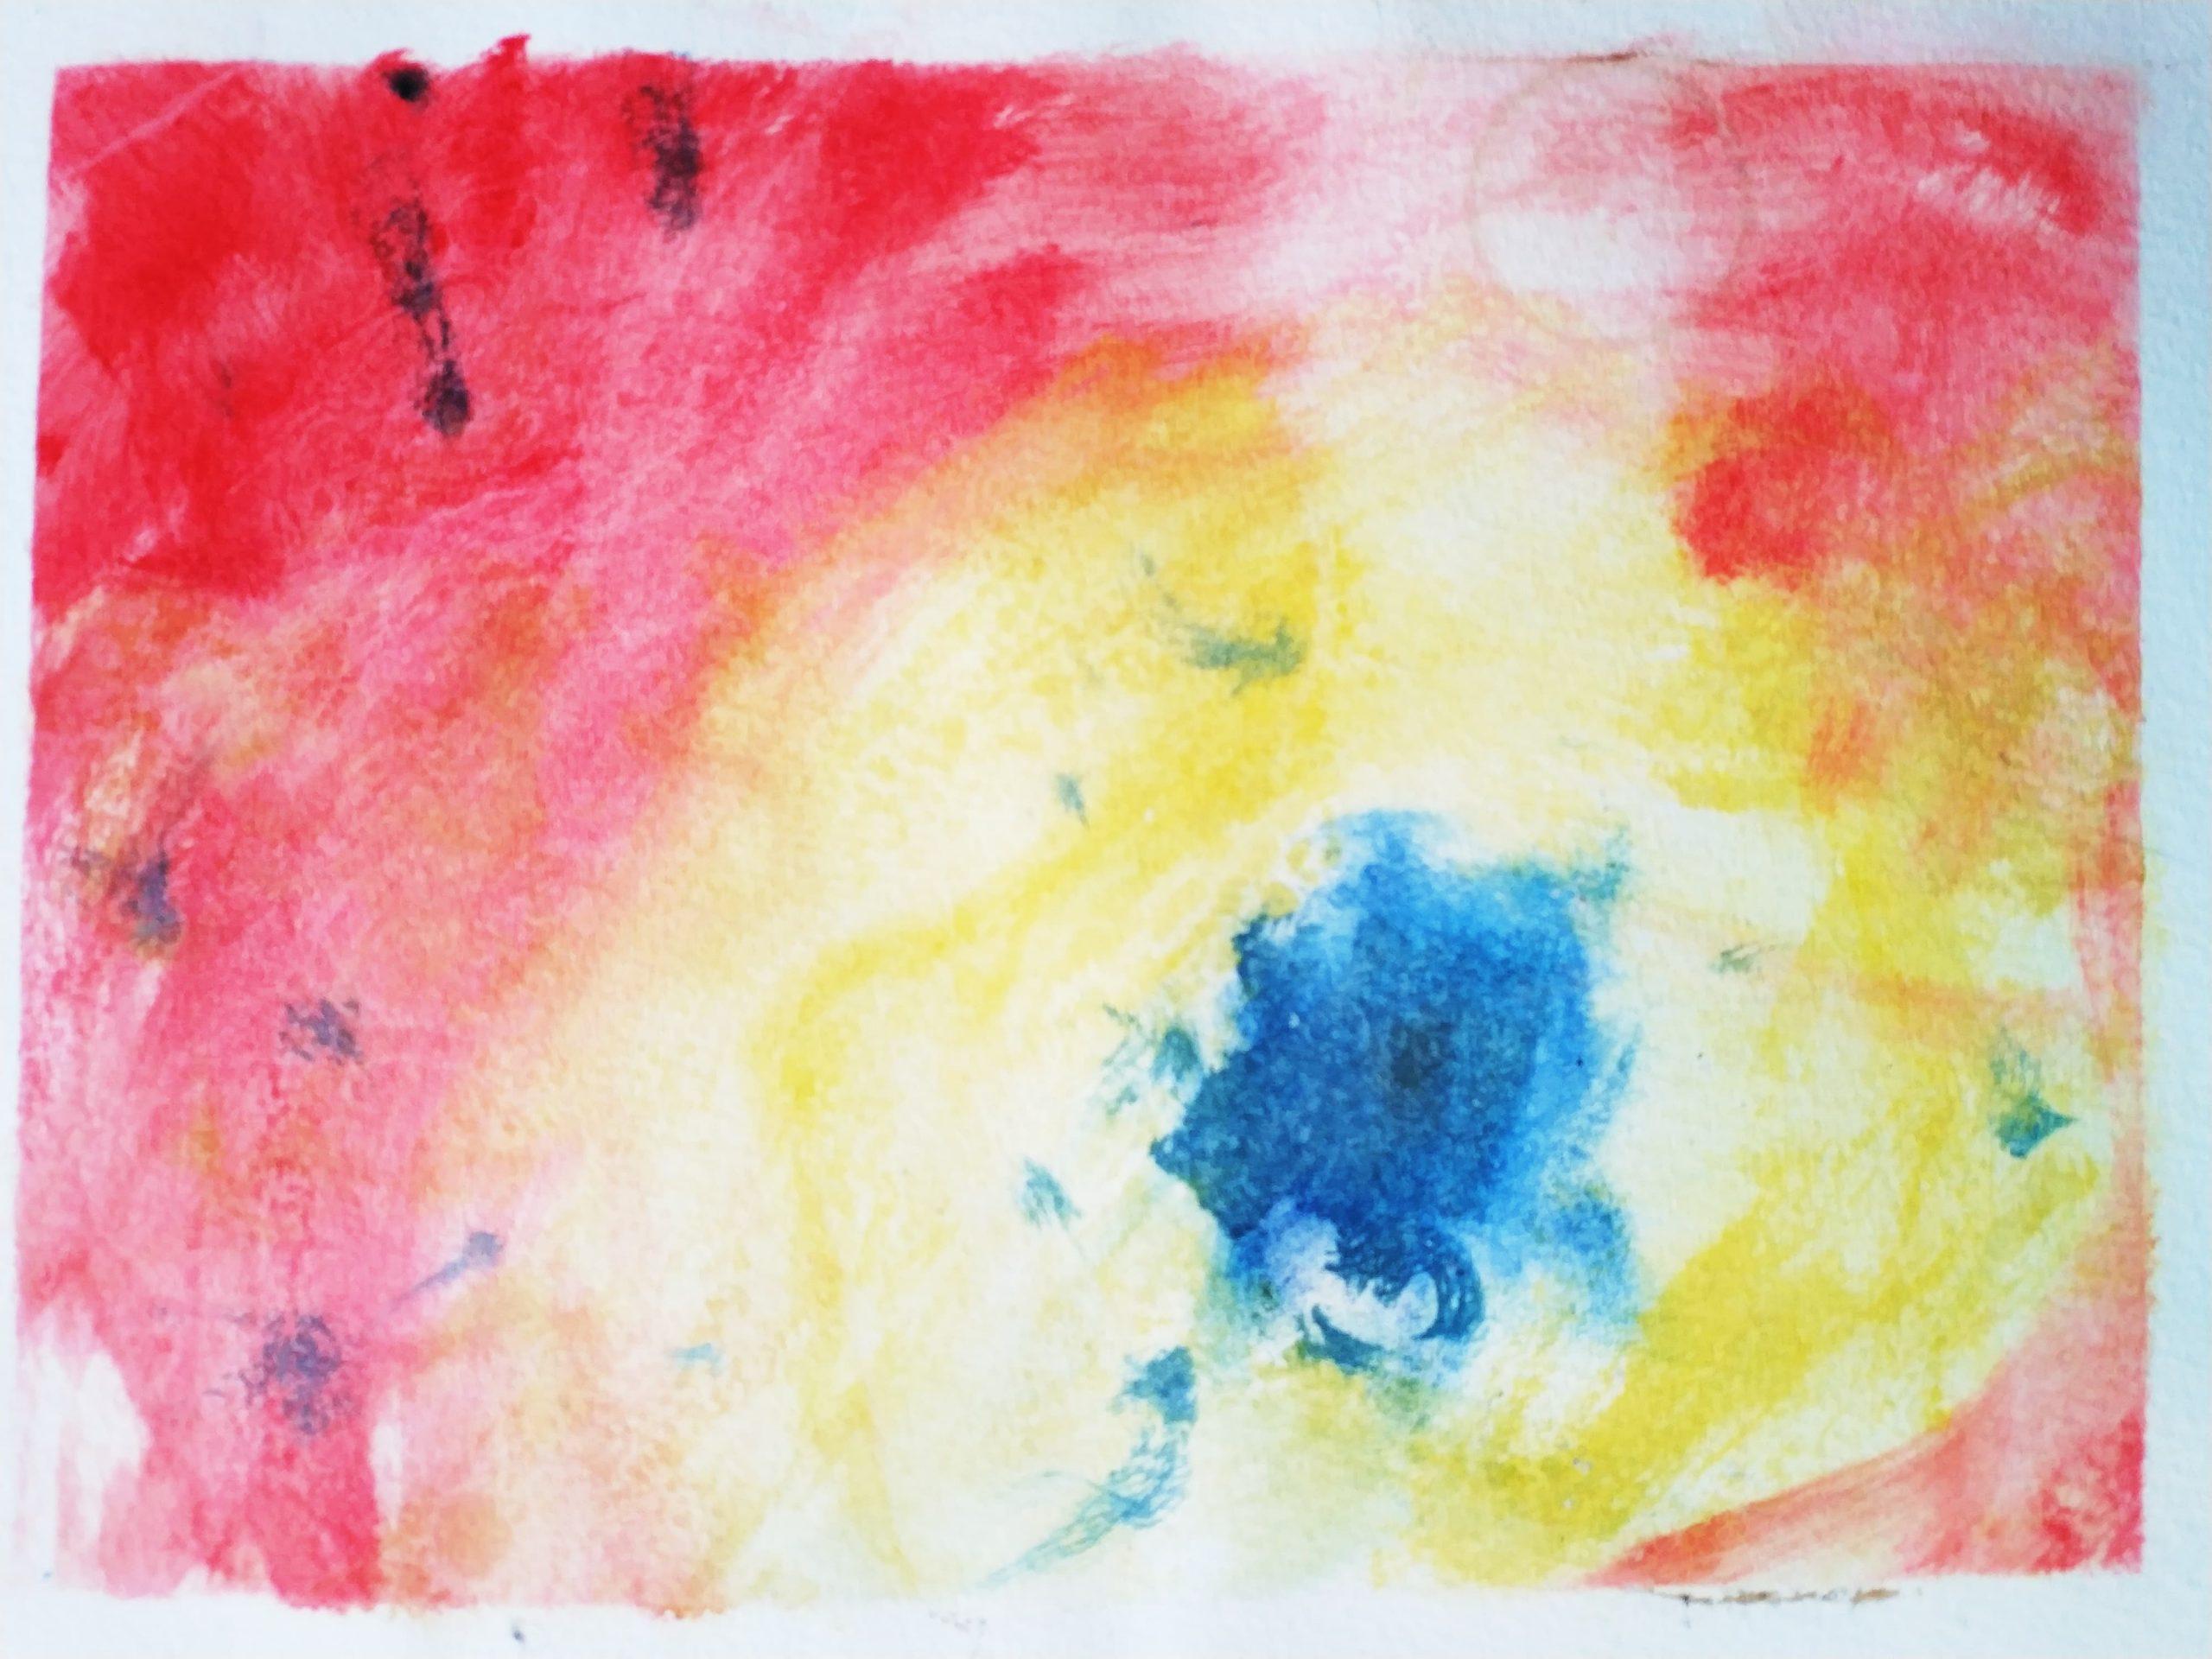 OUG13-Implosion, 20x28cm watercolour, 200€